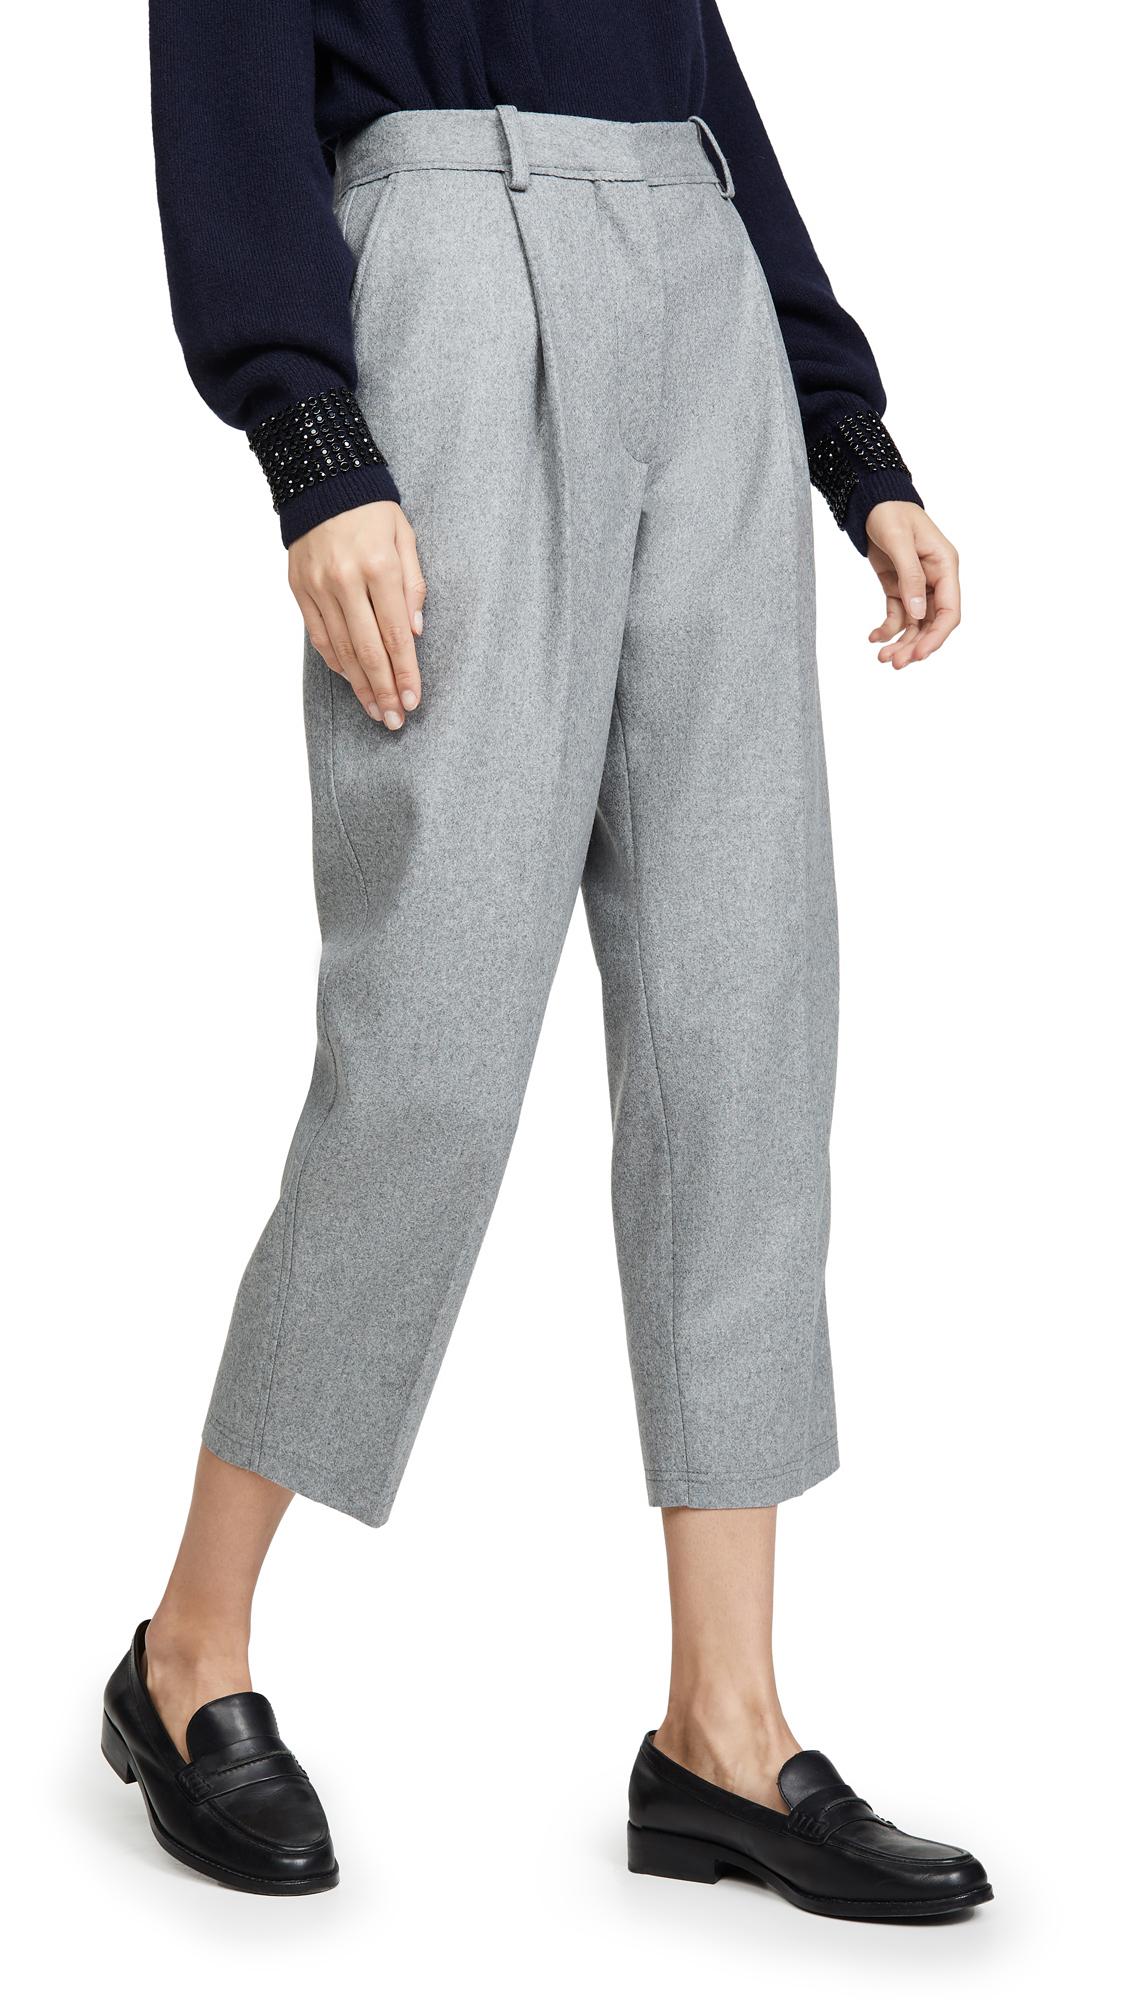 Acne Studios Flannel Trousers - Platinum Grey Melange